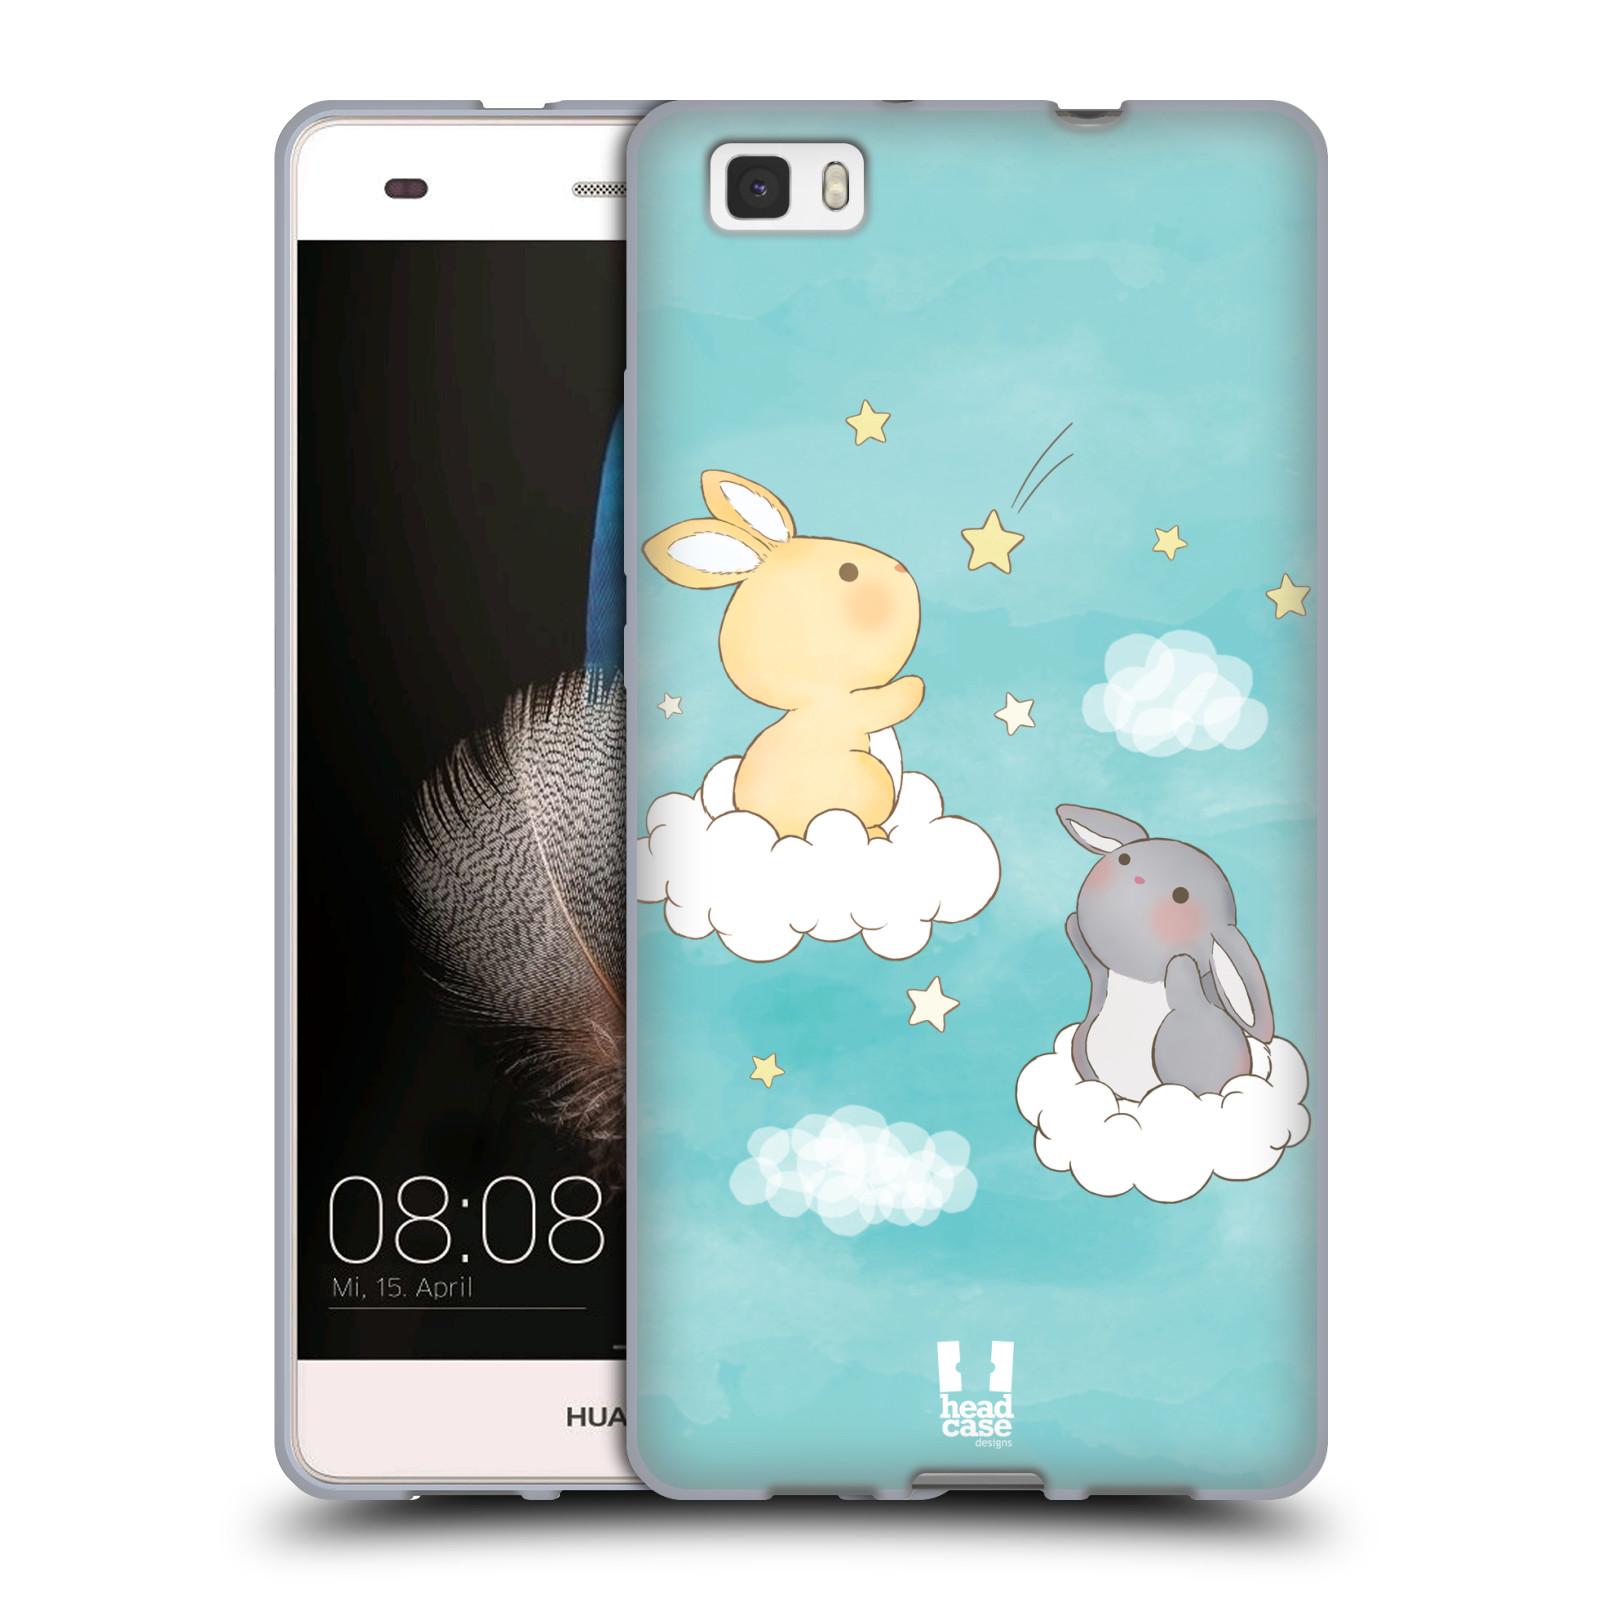 HEAD CASE silikonový obal na mobil HUAWEI P8 LITE vzor králíček a hvězdy modrá